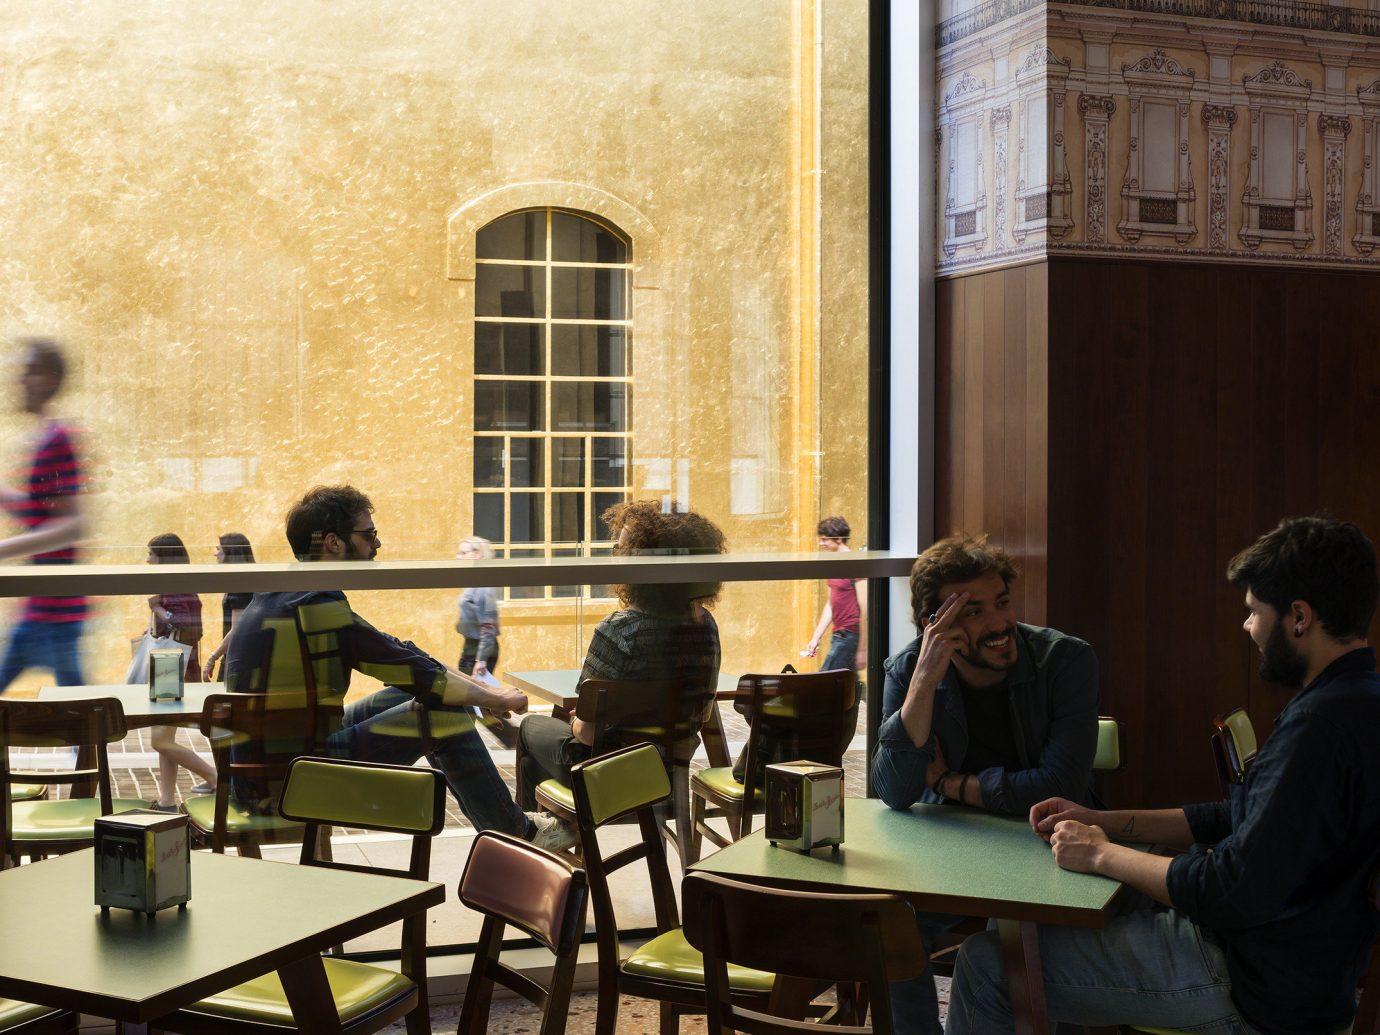 Food + Drink person room interior design tourist attraction